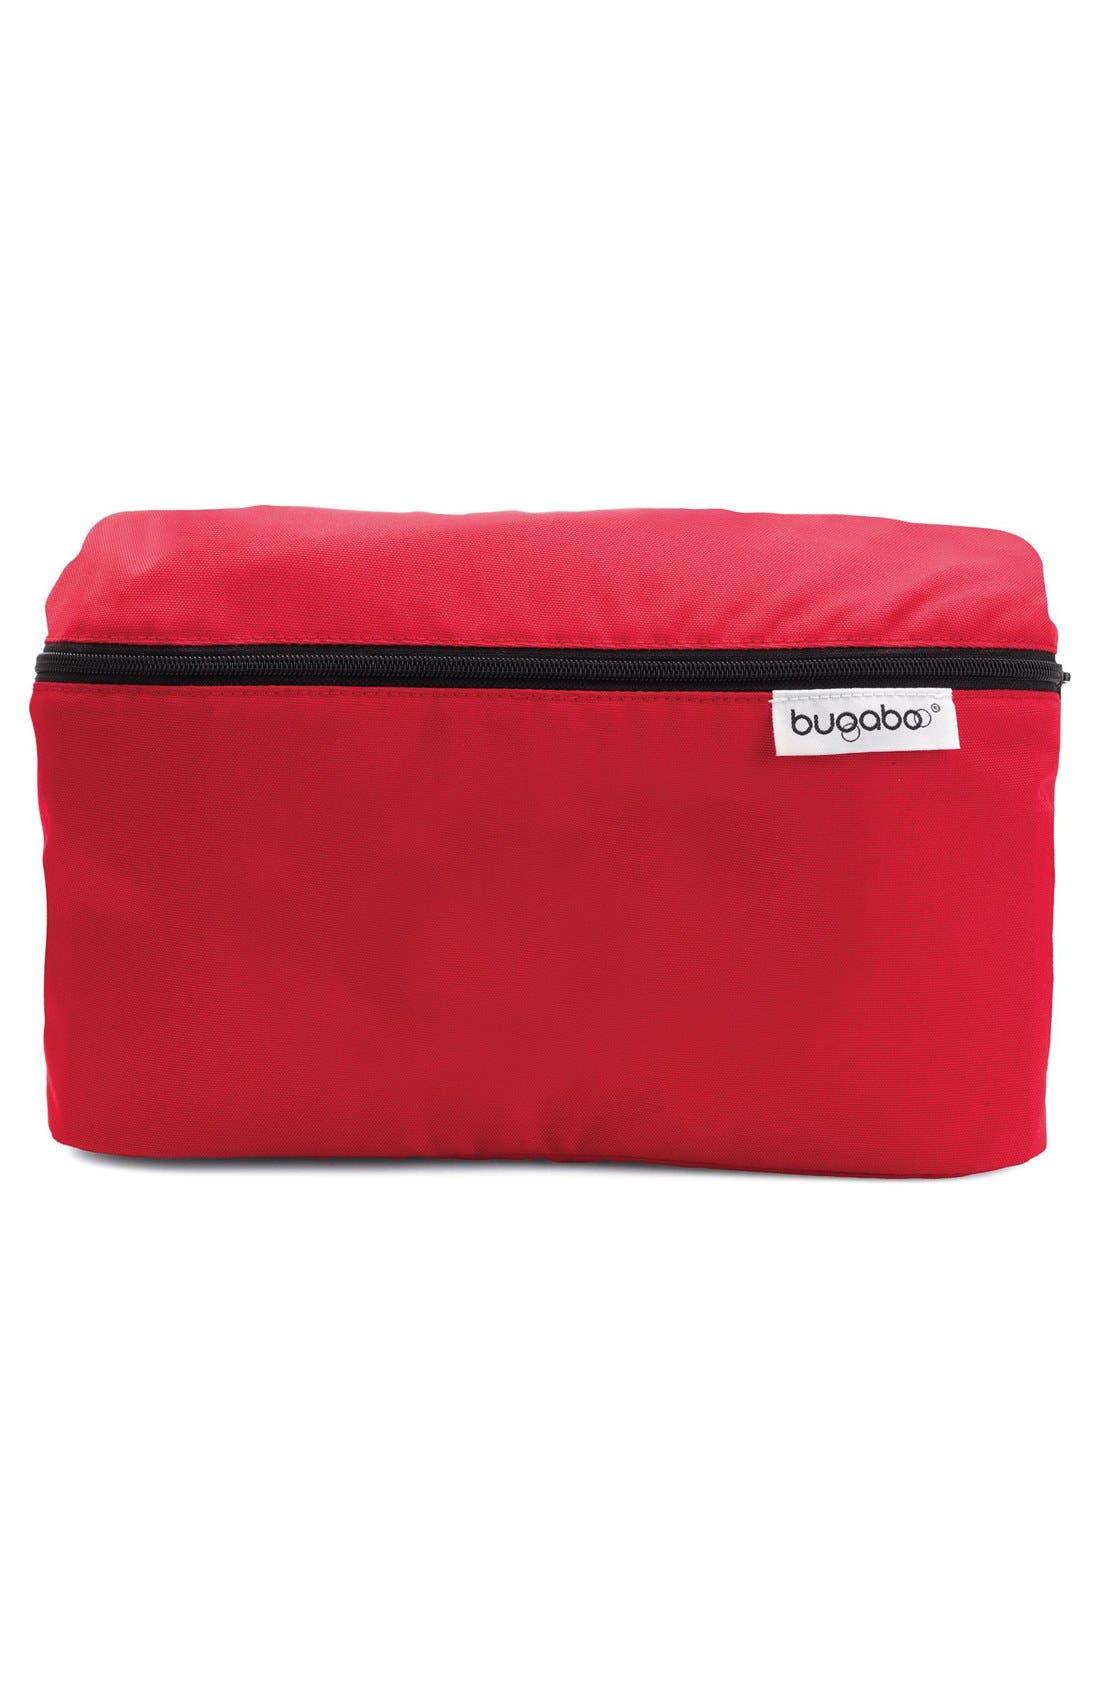 Compact Transport Bag,                             Alternate thumbnail 5, color,                             001